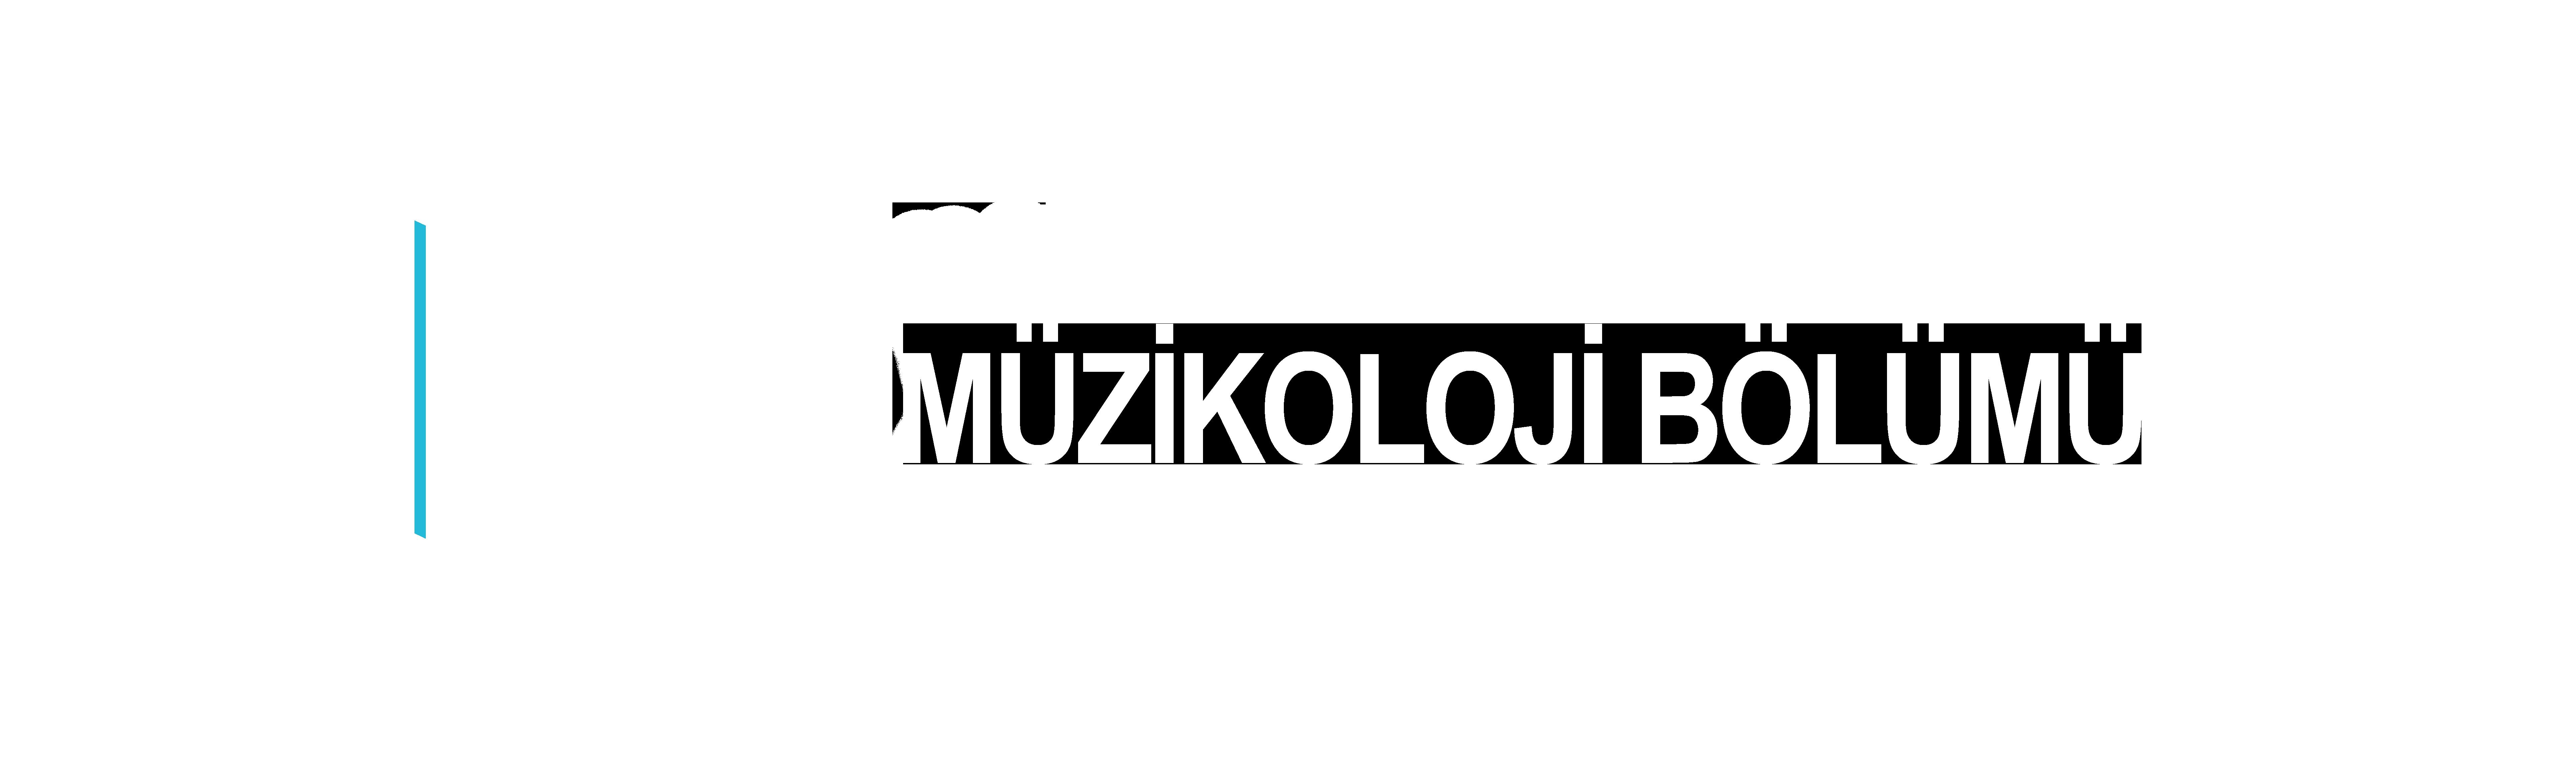 Müzikoloji Bölümü